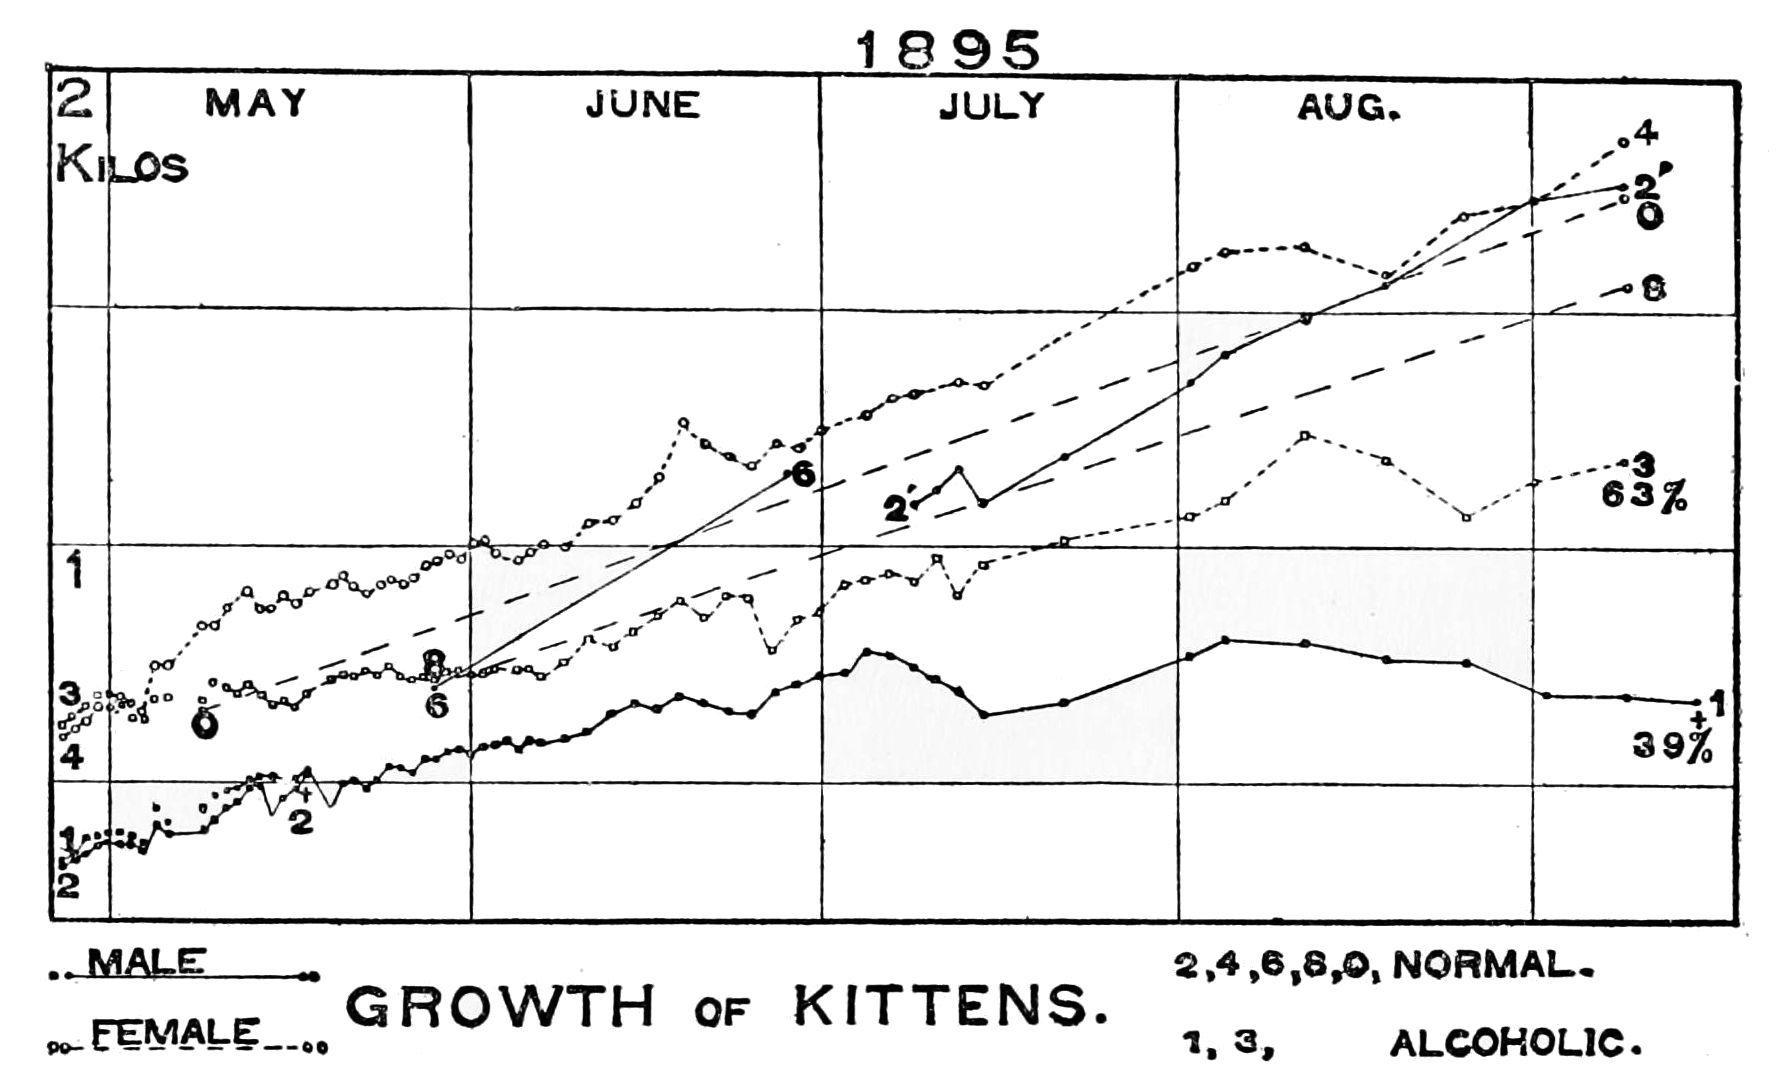 Height weight chart male female edgrafik height weight chart male female psm v50 d620 alcoholic vs normal kitten growth rate nvjuhfo Images